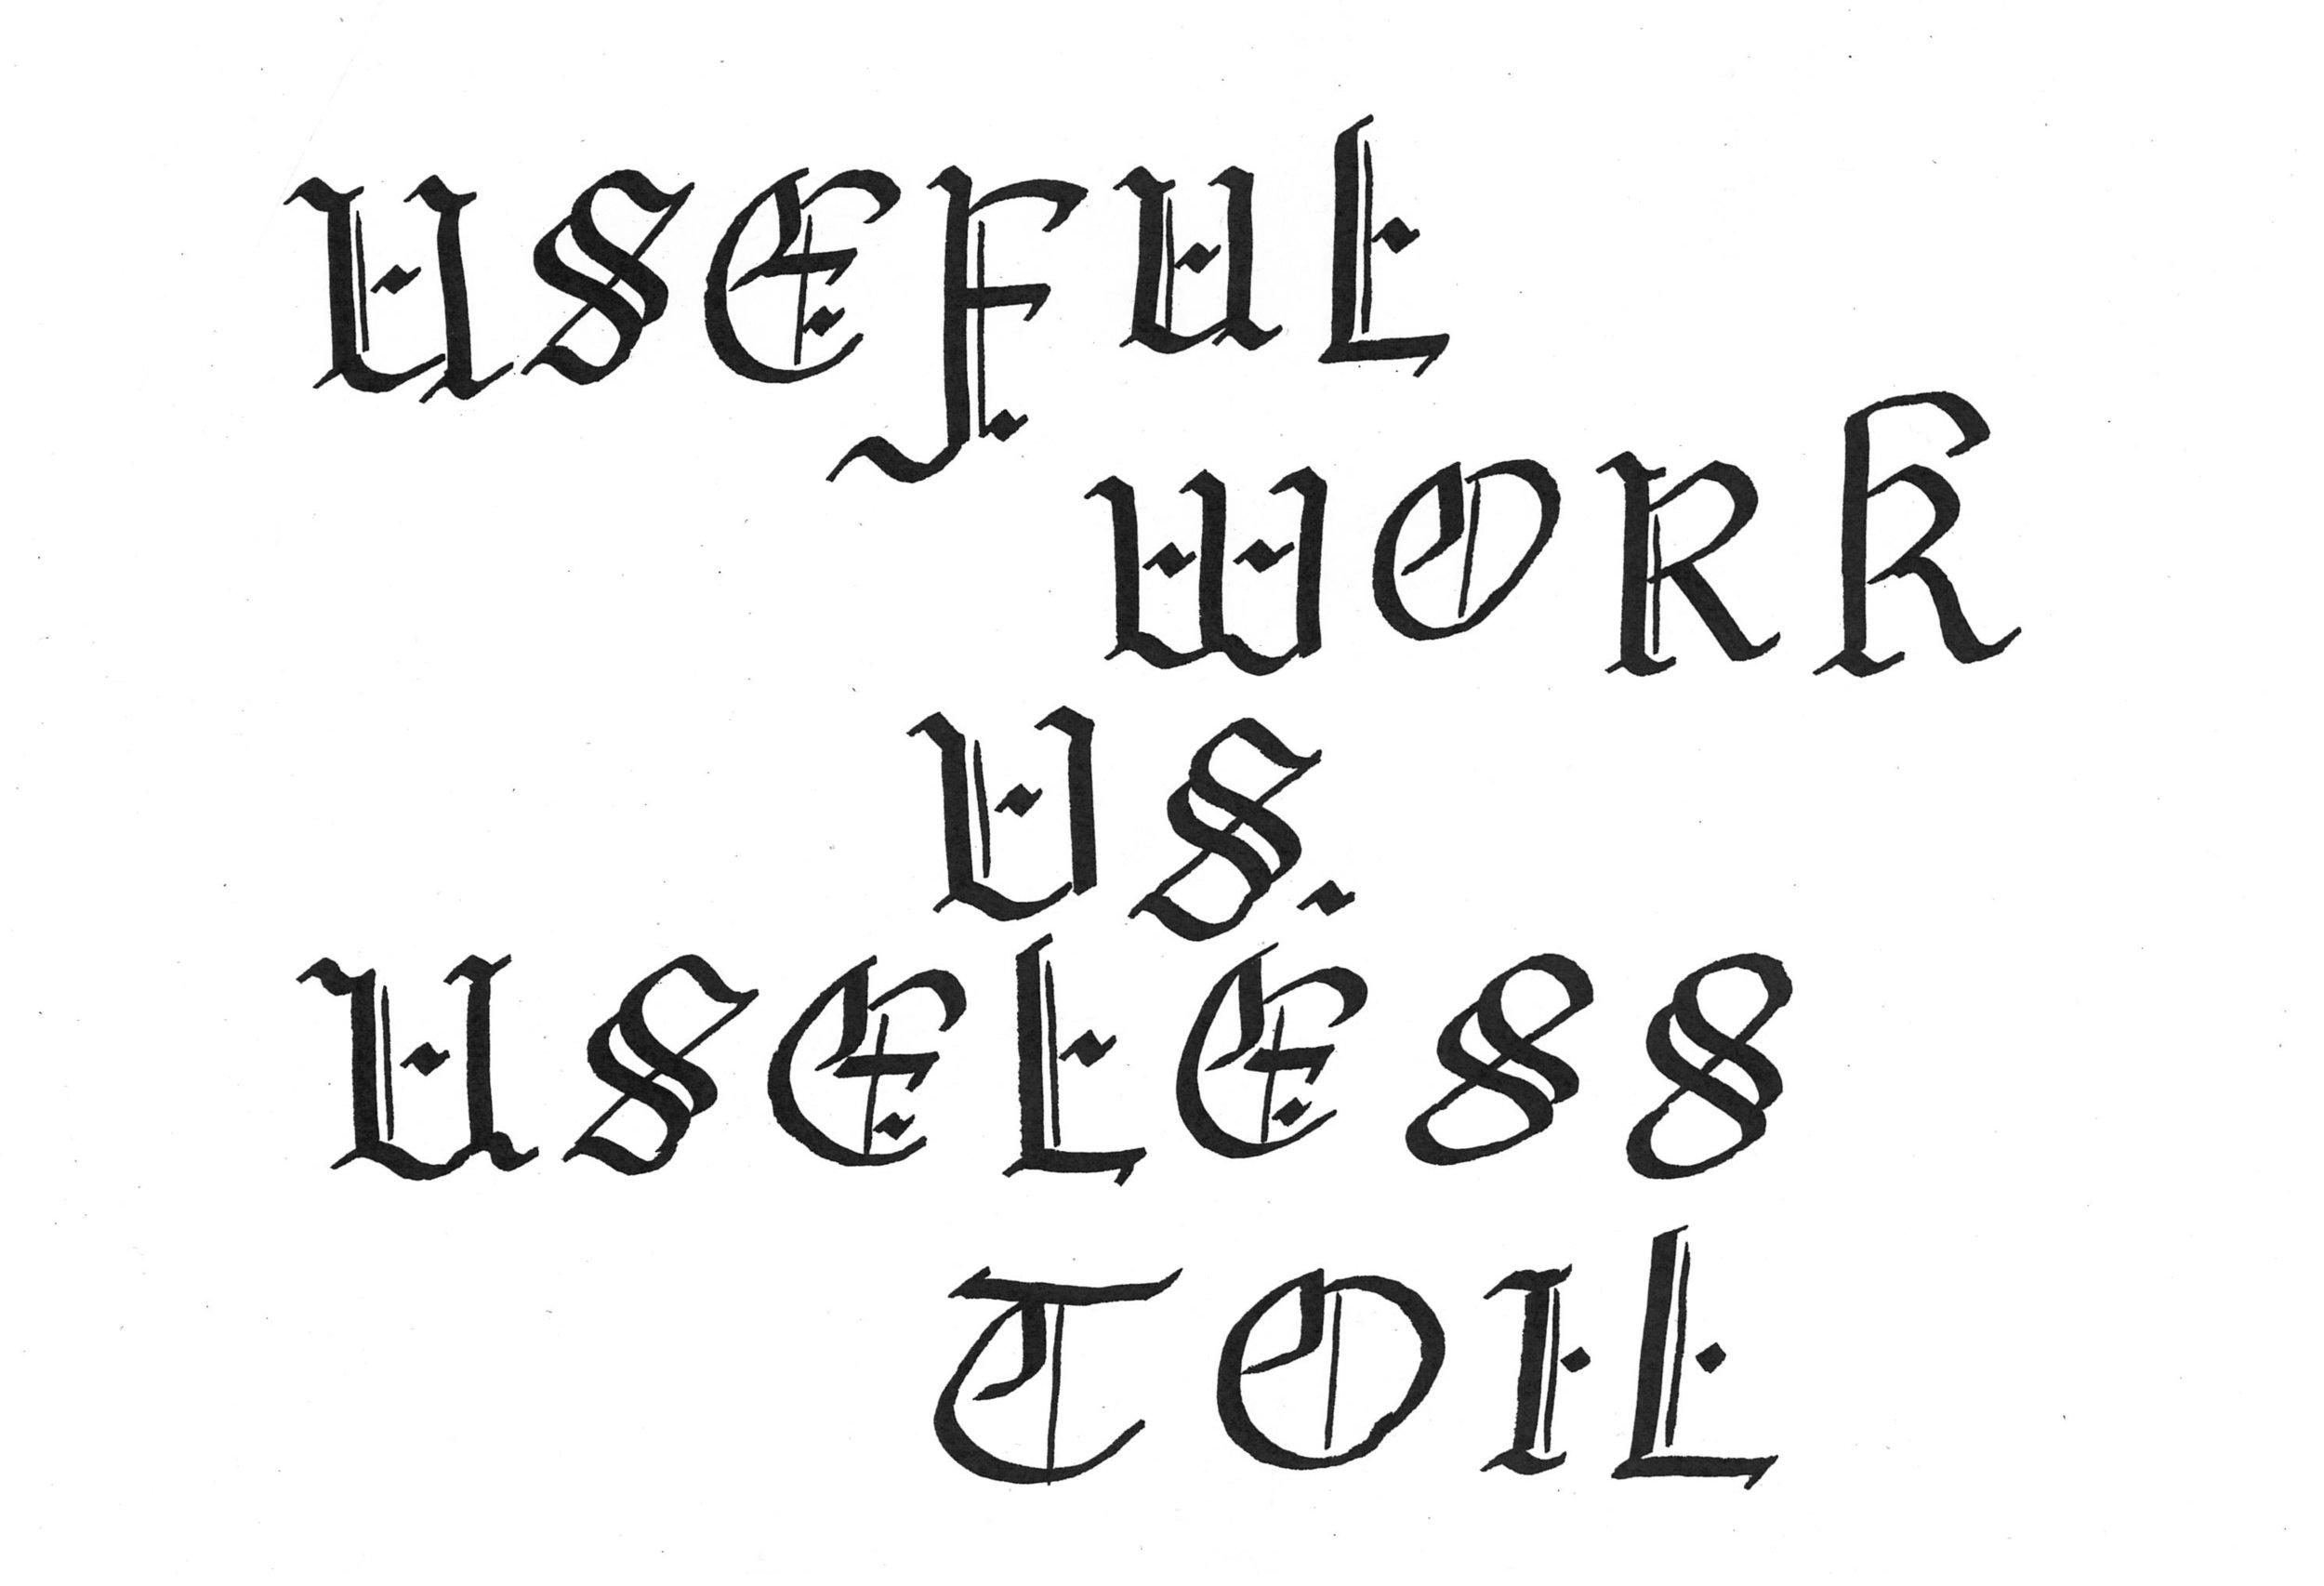 Useful Work Verus Useless Toil (1).jpg